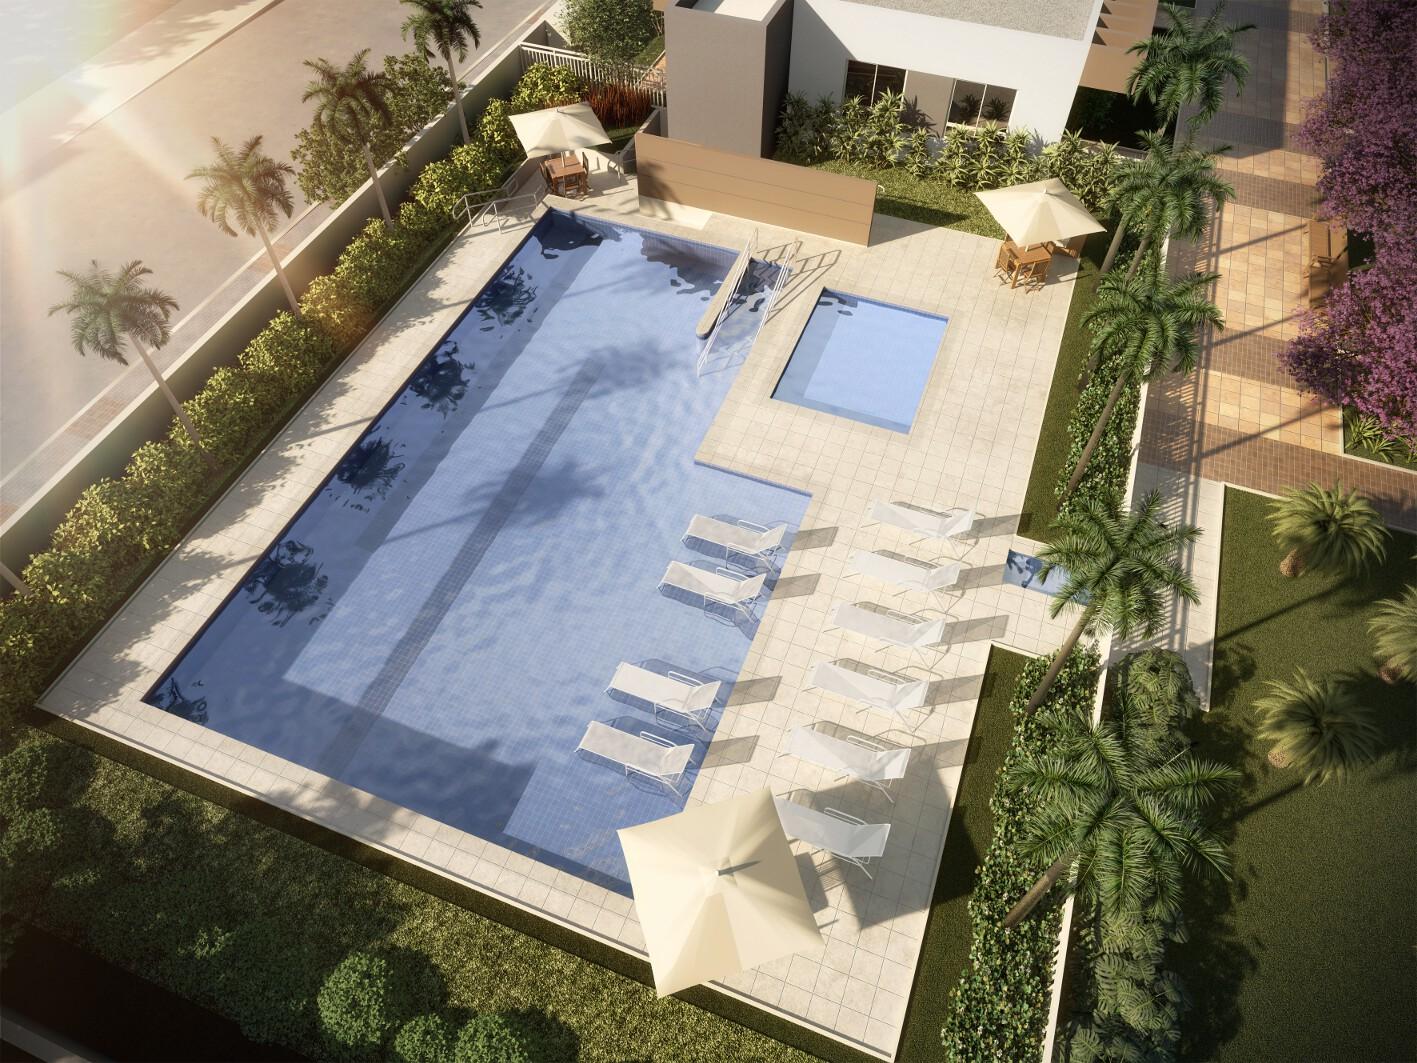 Destaque - Lazer da piscina